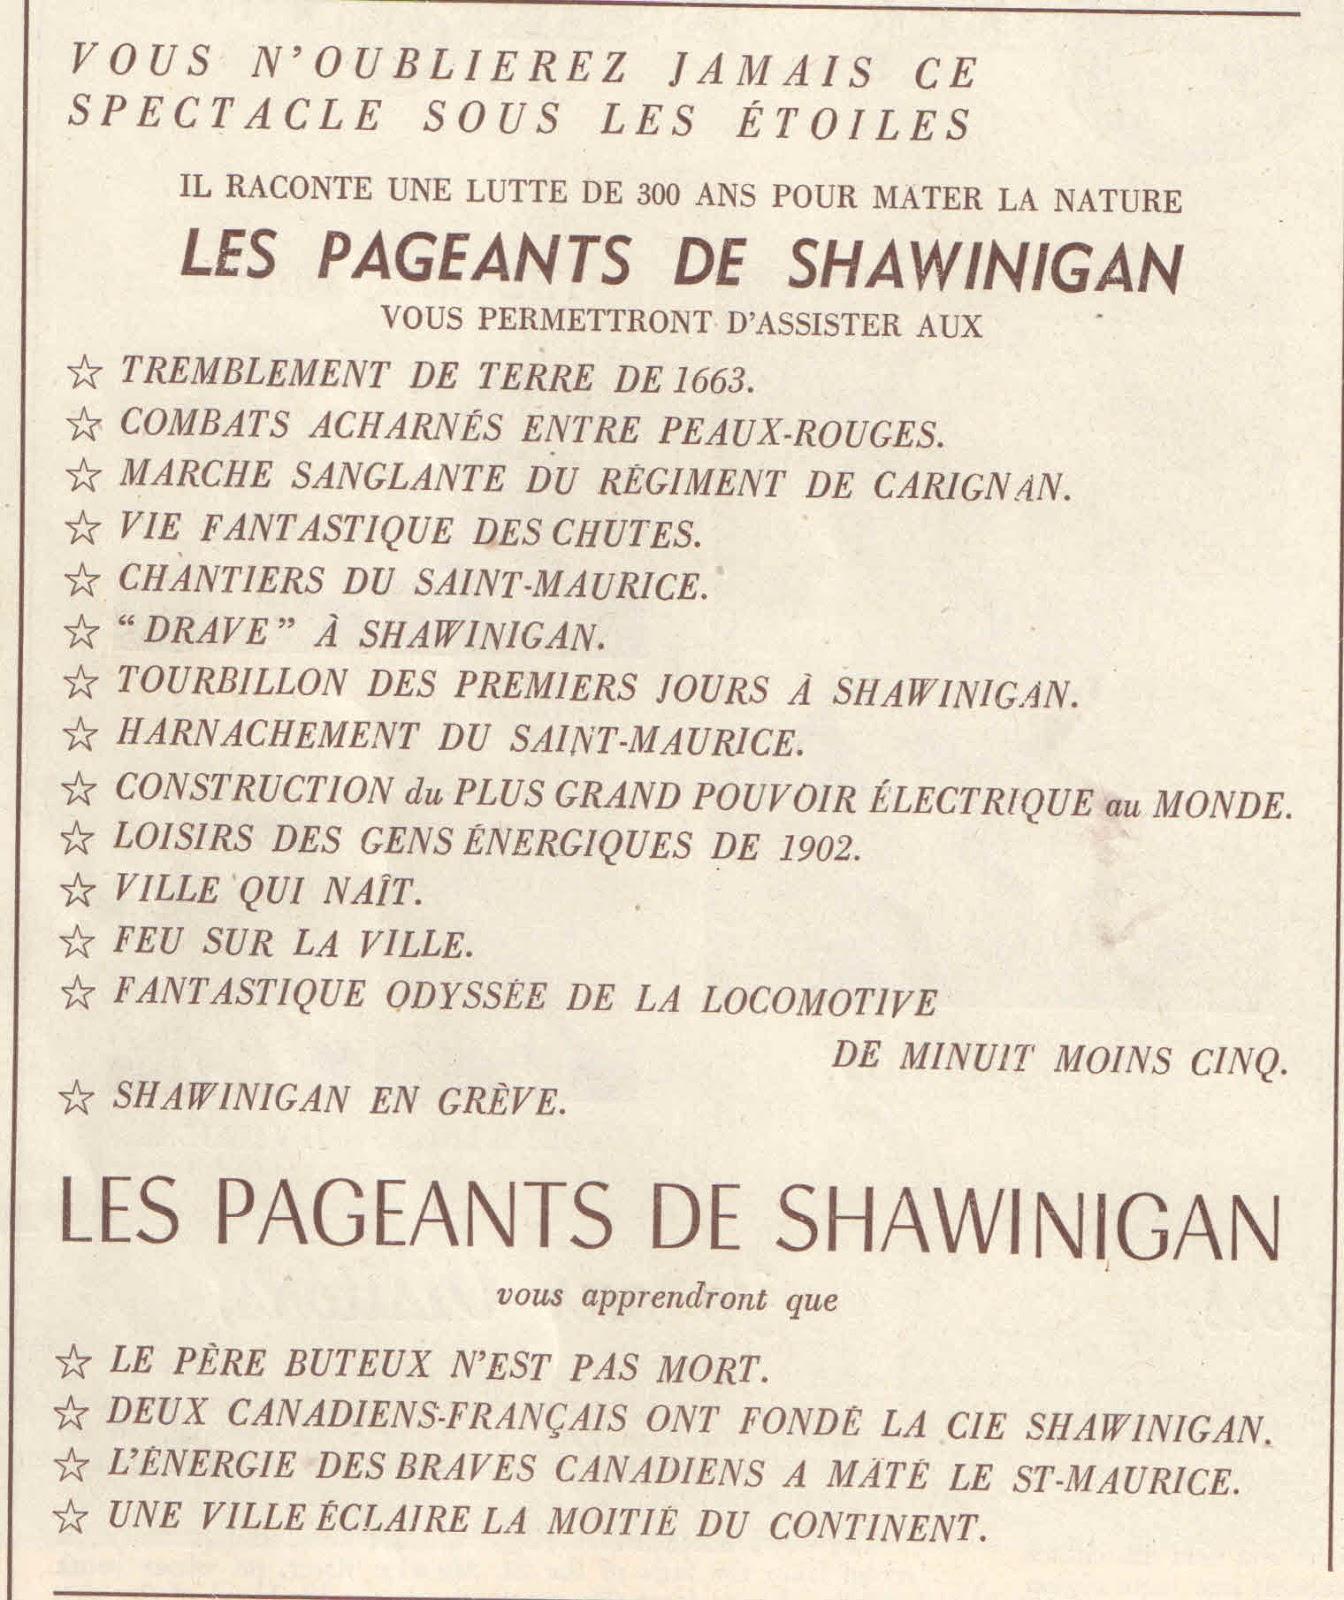 Rencontre shawinigan